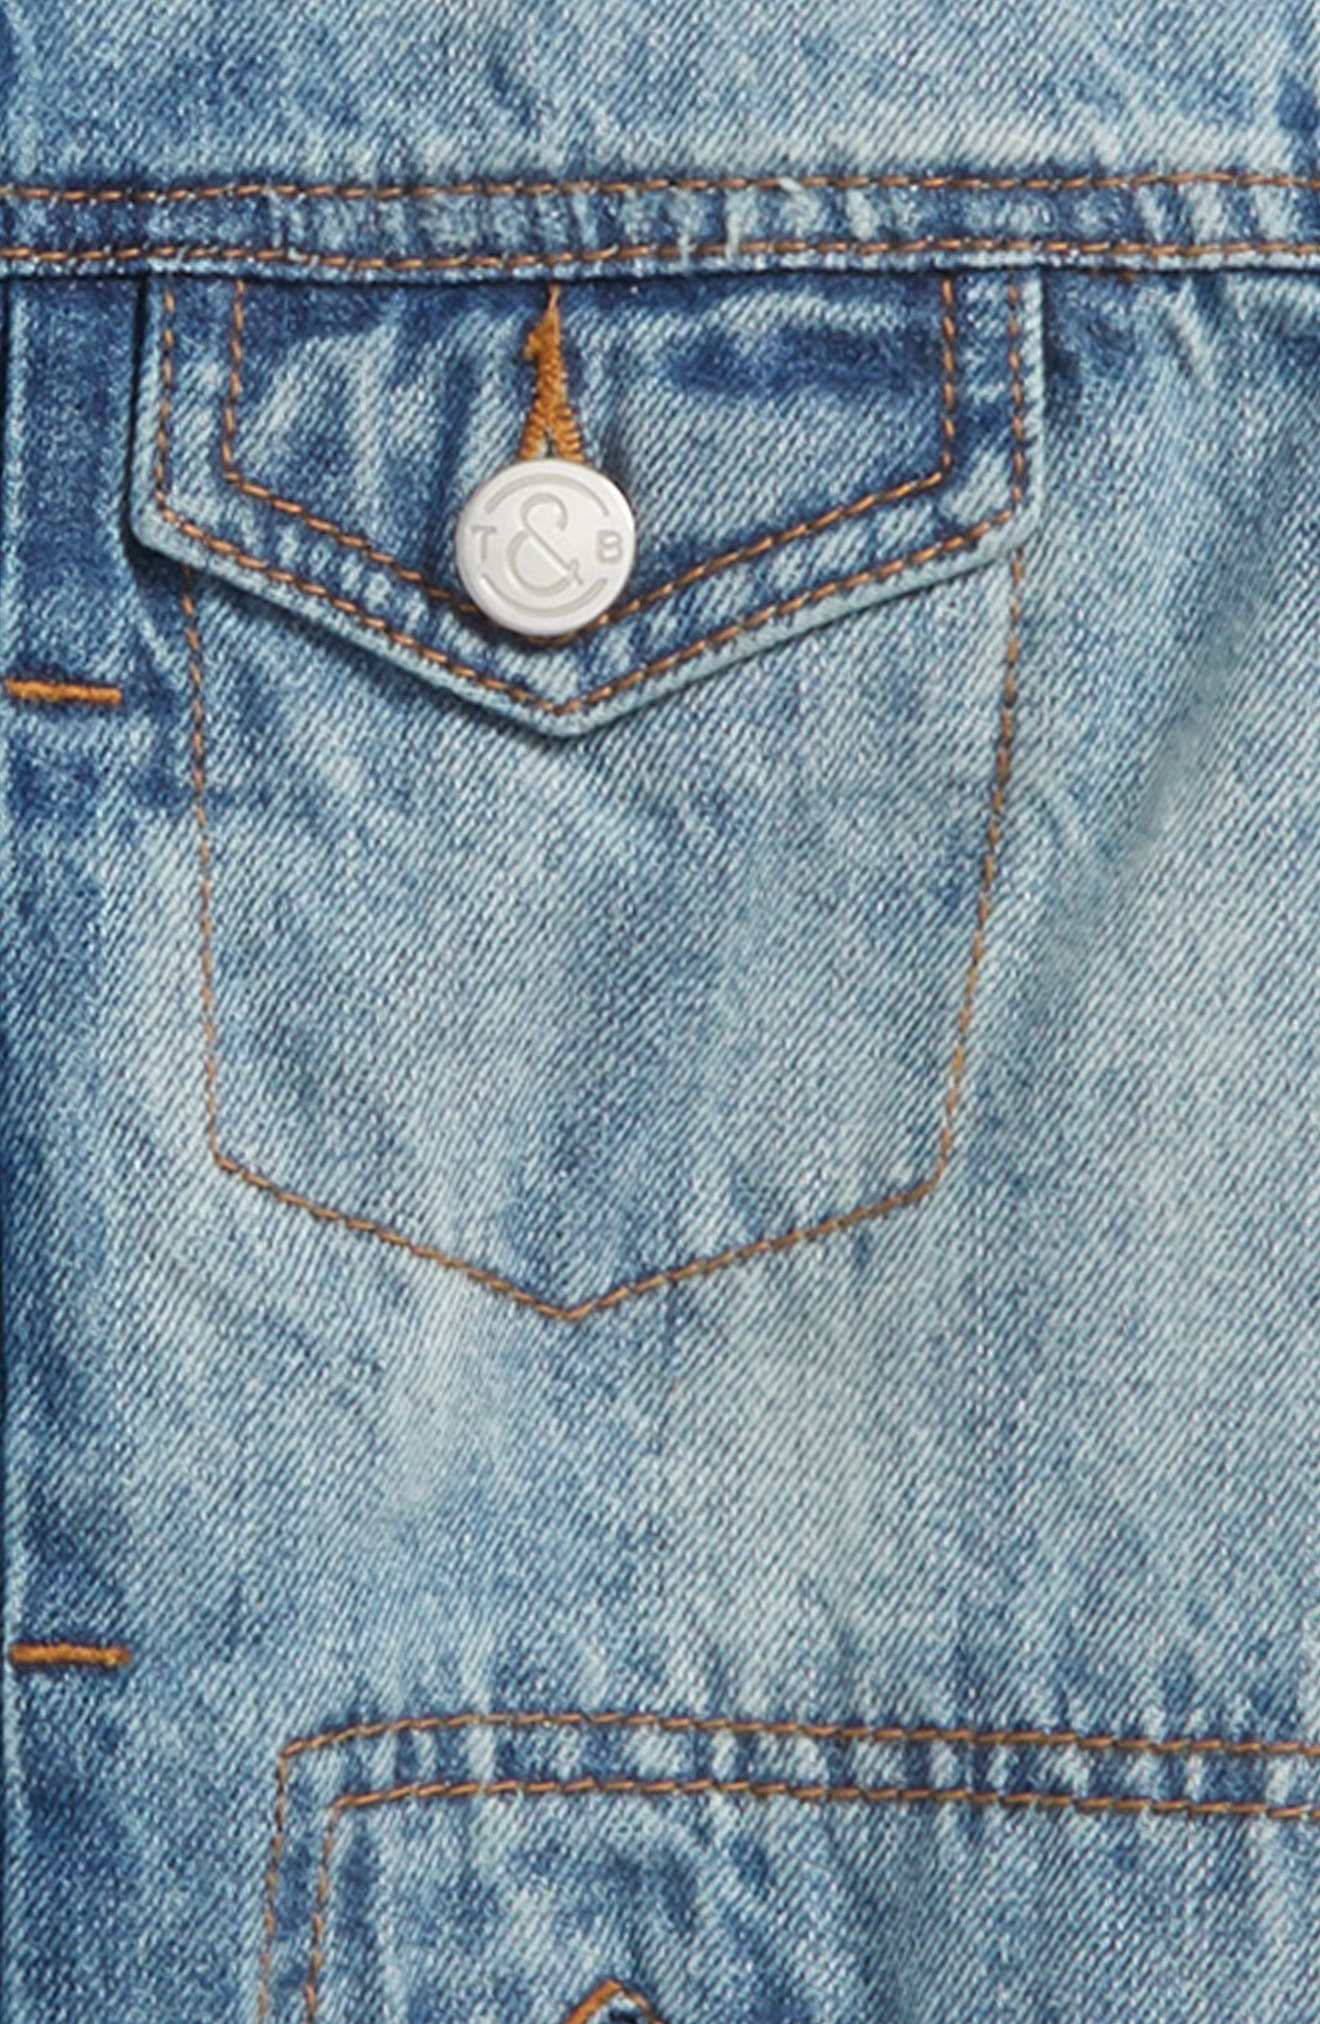 Front Zip Denim Jacket,                             Alternate thumbnail 2, color,                             420